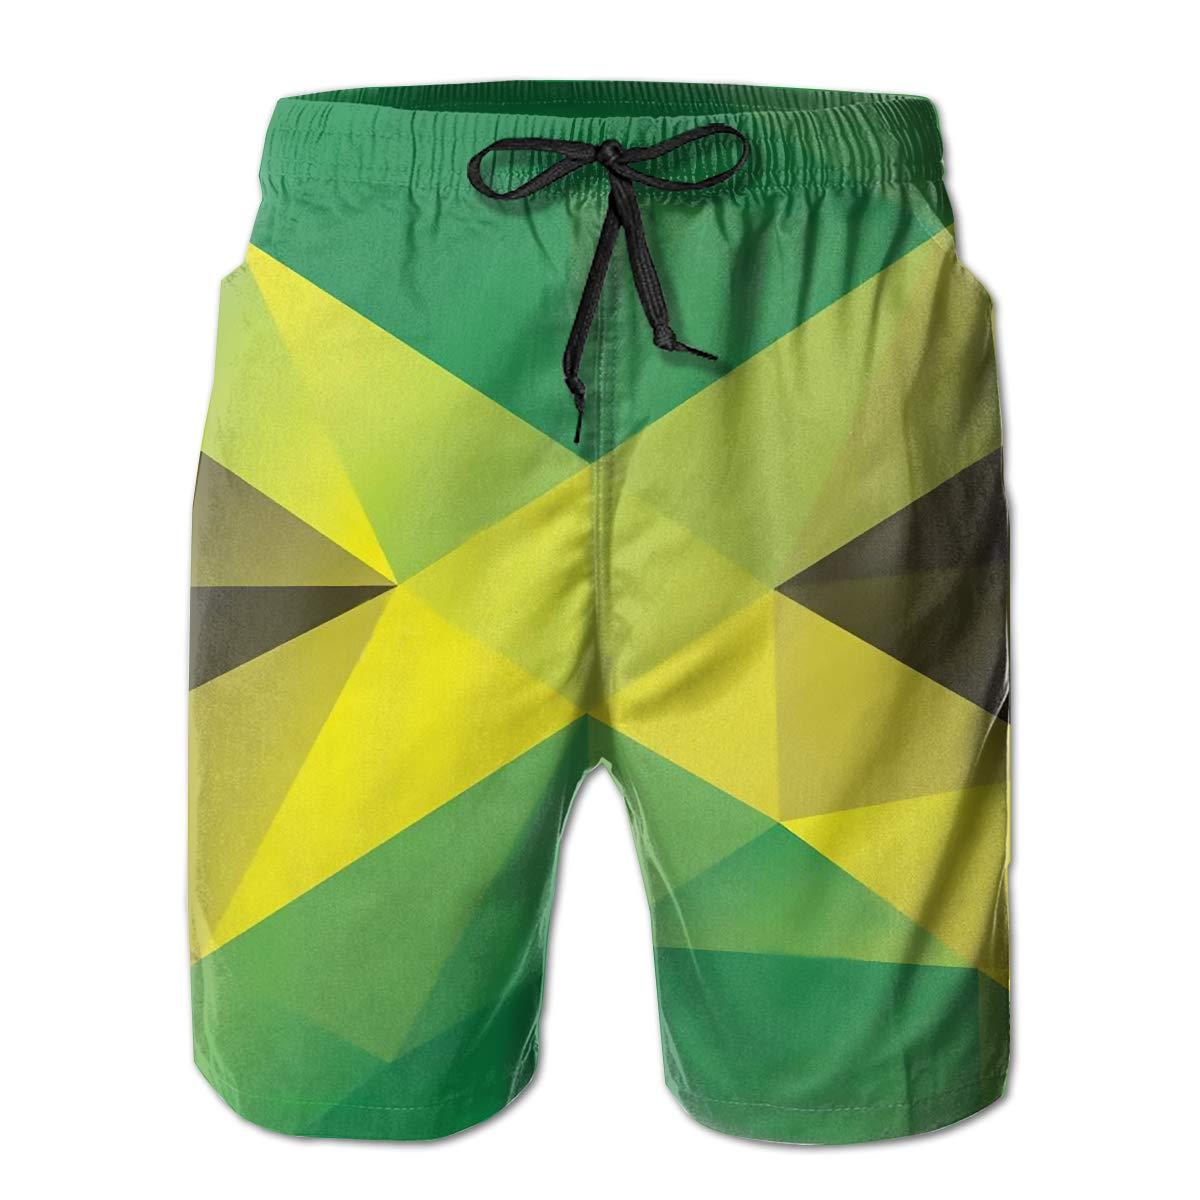 HHHDAM Jamaica Flag Triangular Mens Swim Trunks Board Beachwear Casual Beach Shorts for Men with Mesh Lining